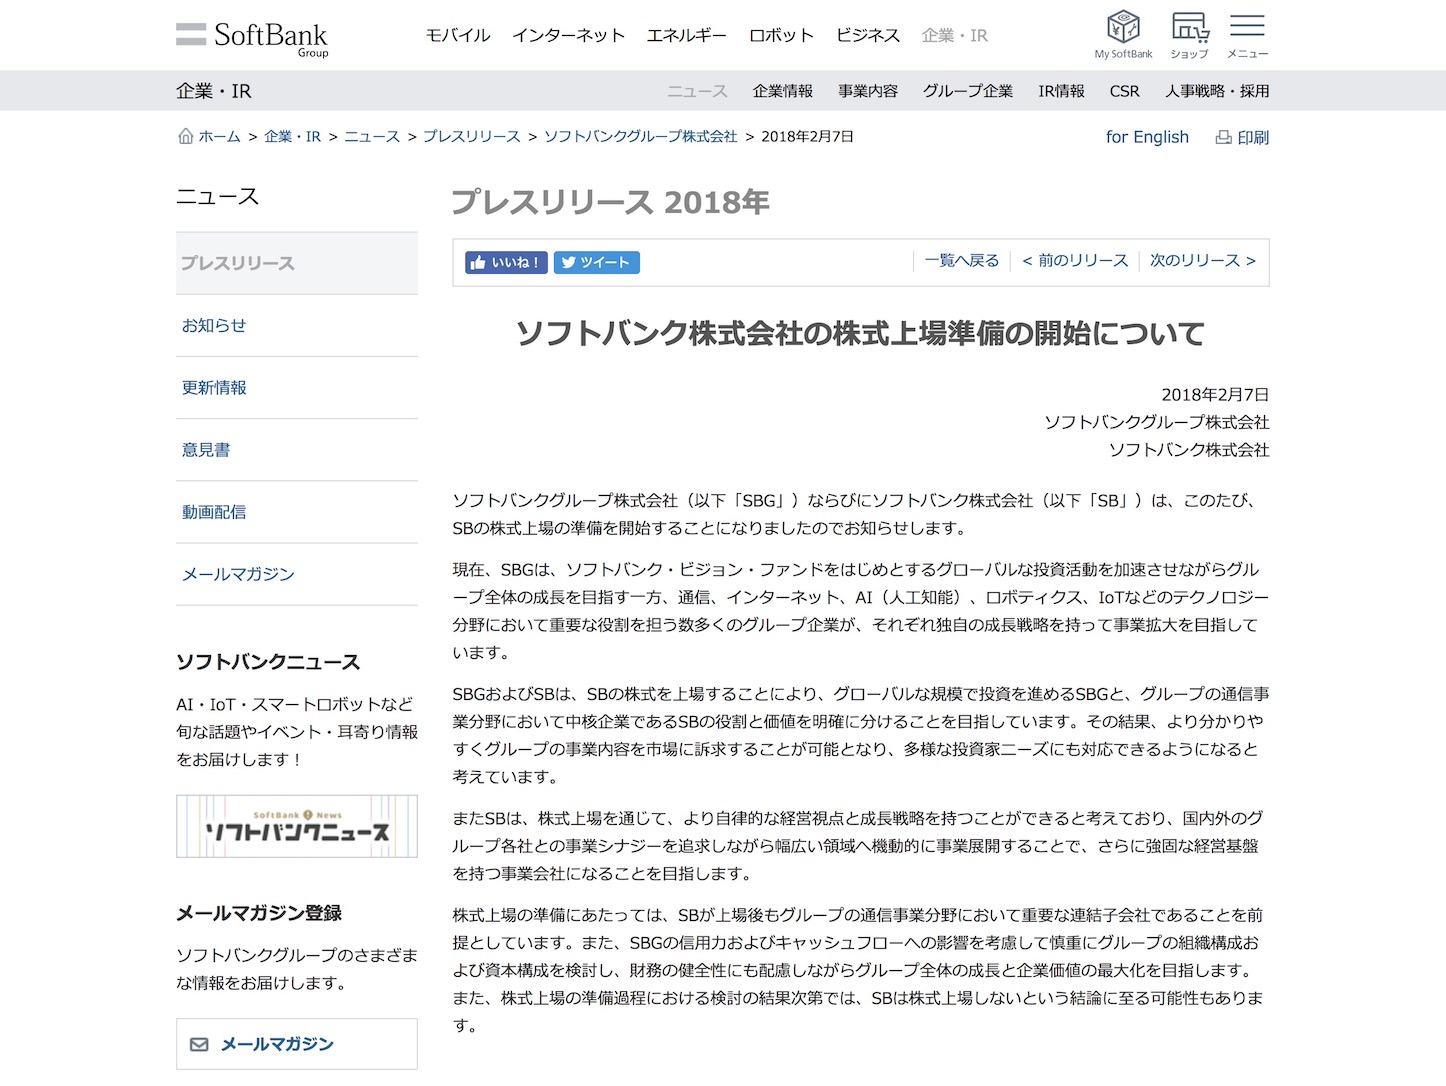 Softbank Listing